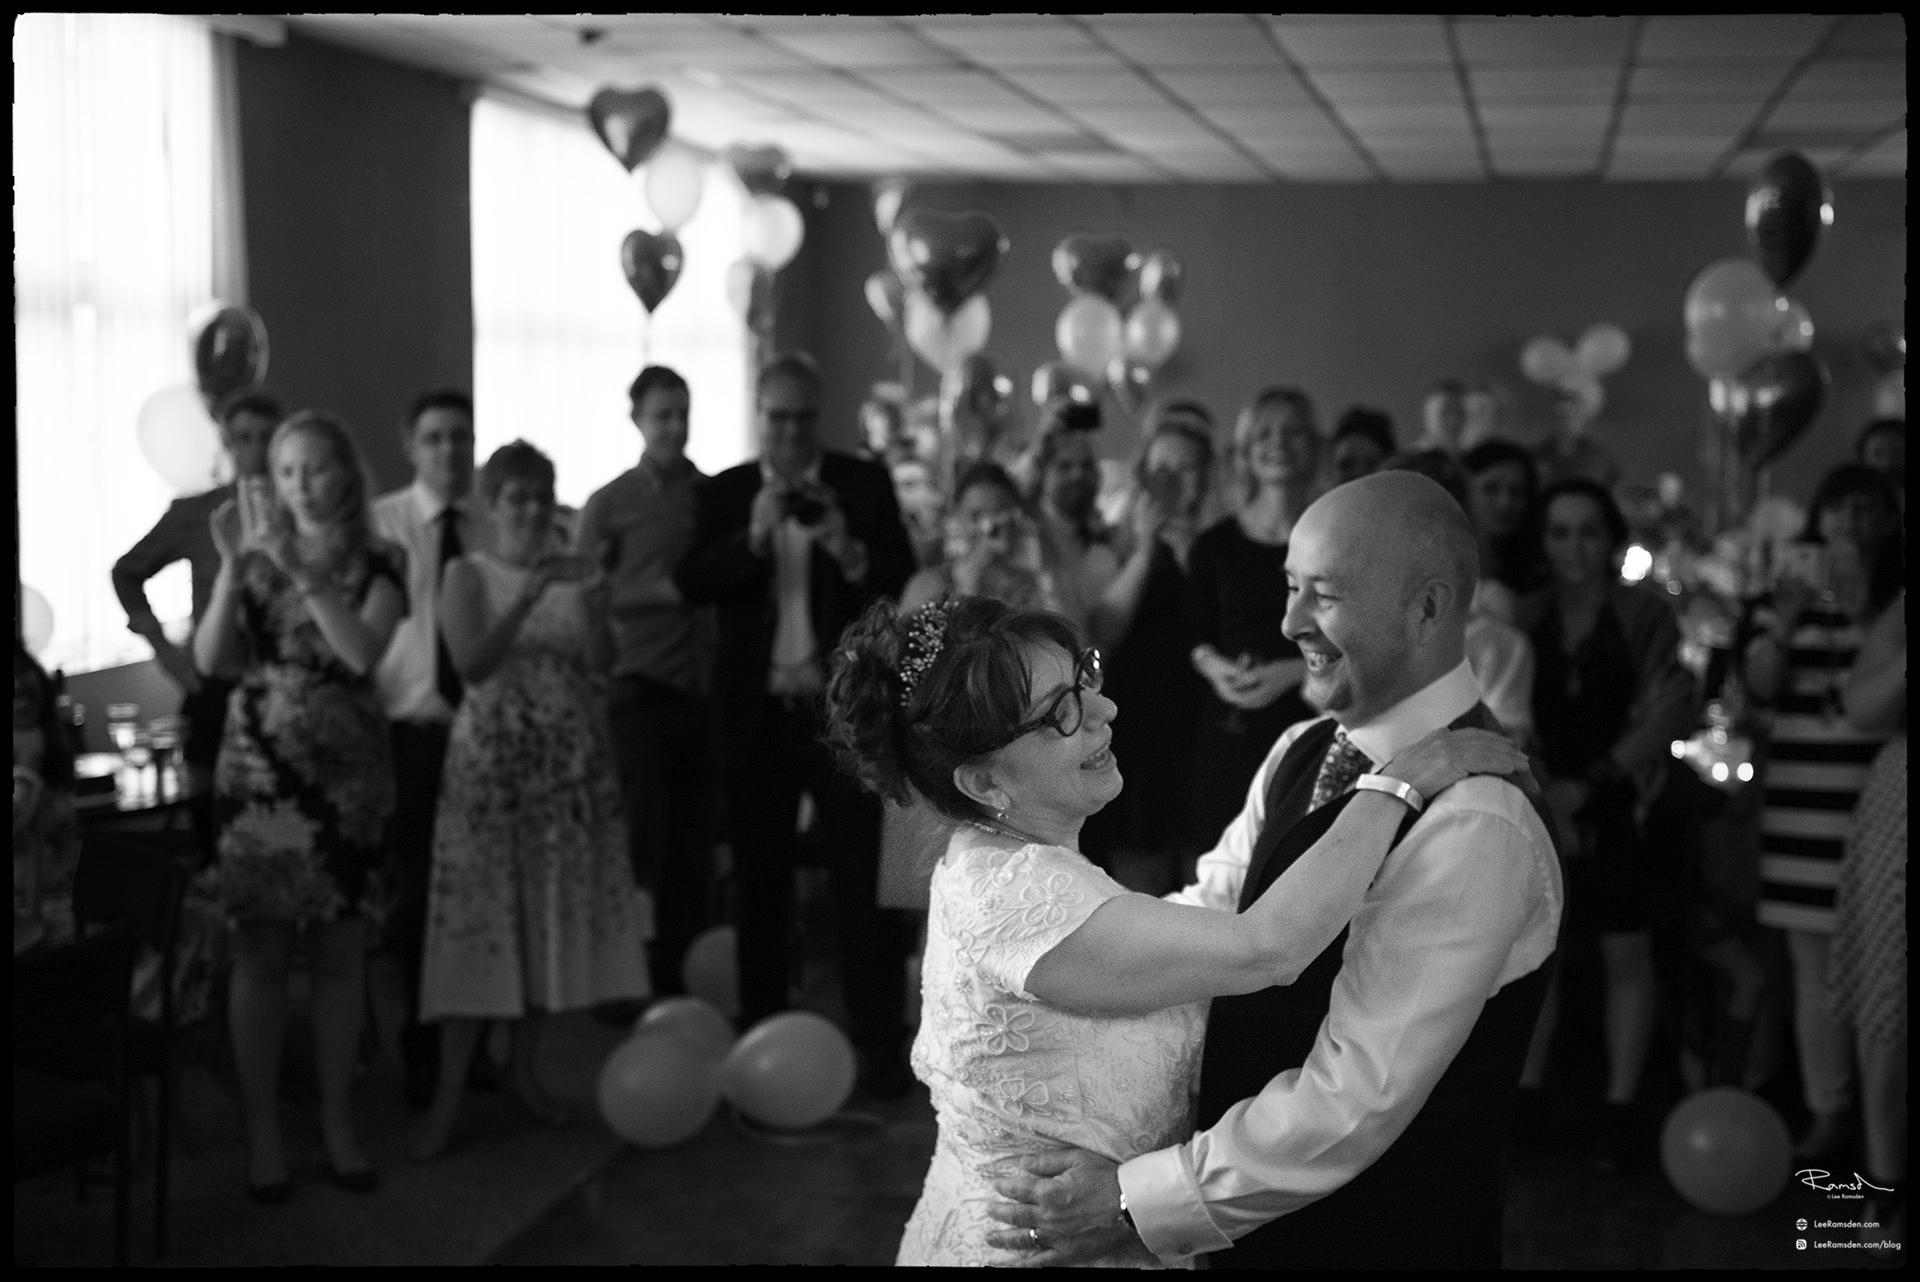 13 Lee Ramsden Wedding photography photographer Lancashire Lytham St Annes Ansdell Fylde reportage professional award winning www.leeramsden.com